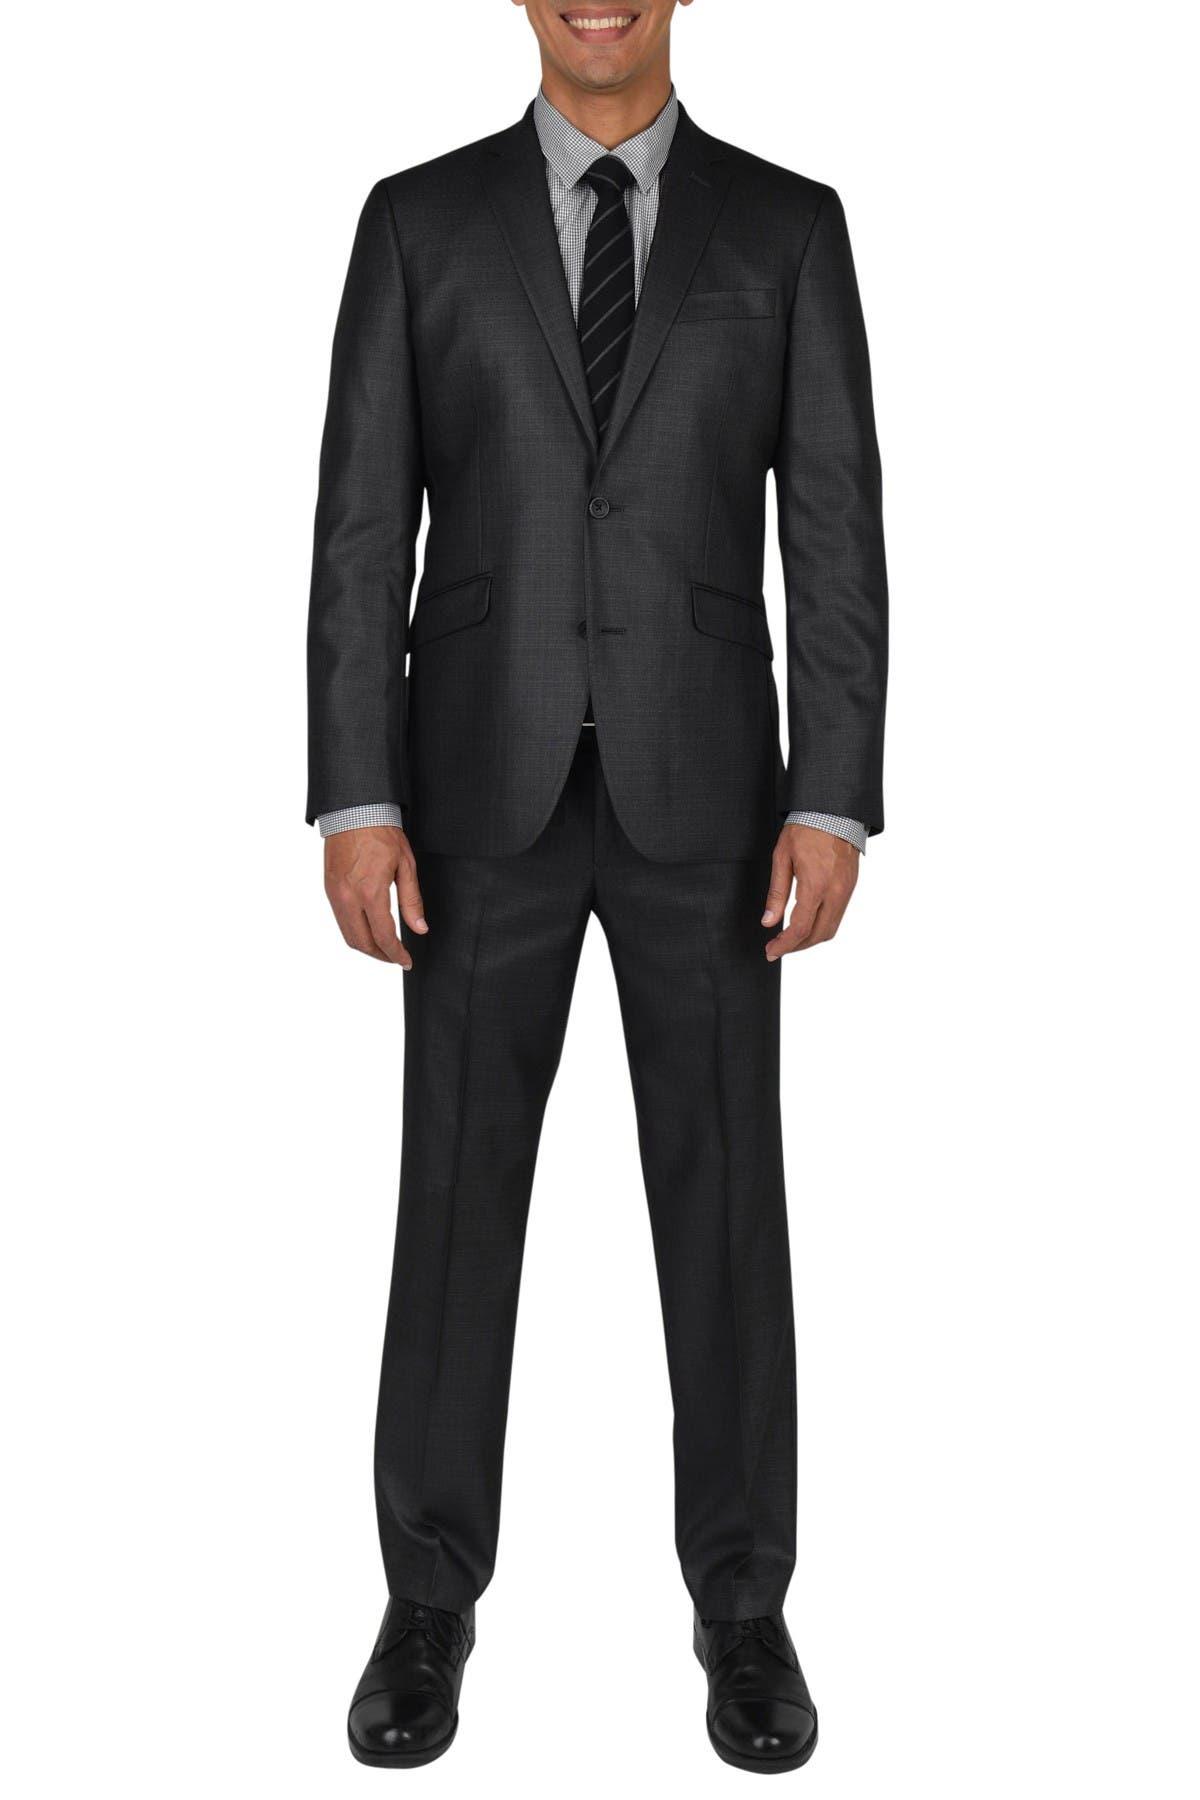 Image of Kenneth Cole Reaction Gunmetal Basketweave Two Button Notch Lapel Slim Fit Suit